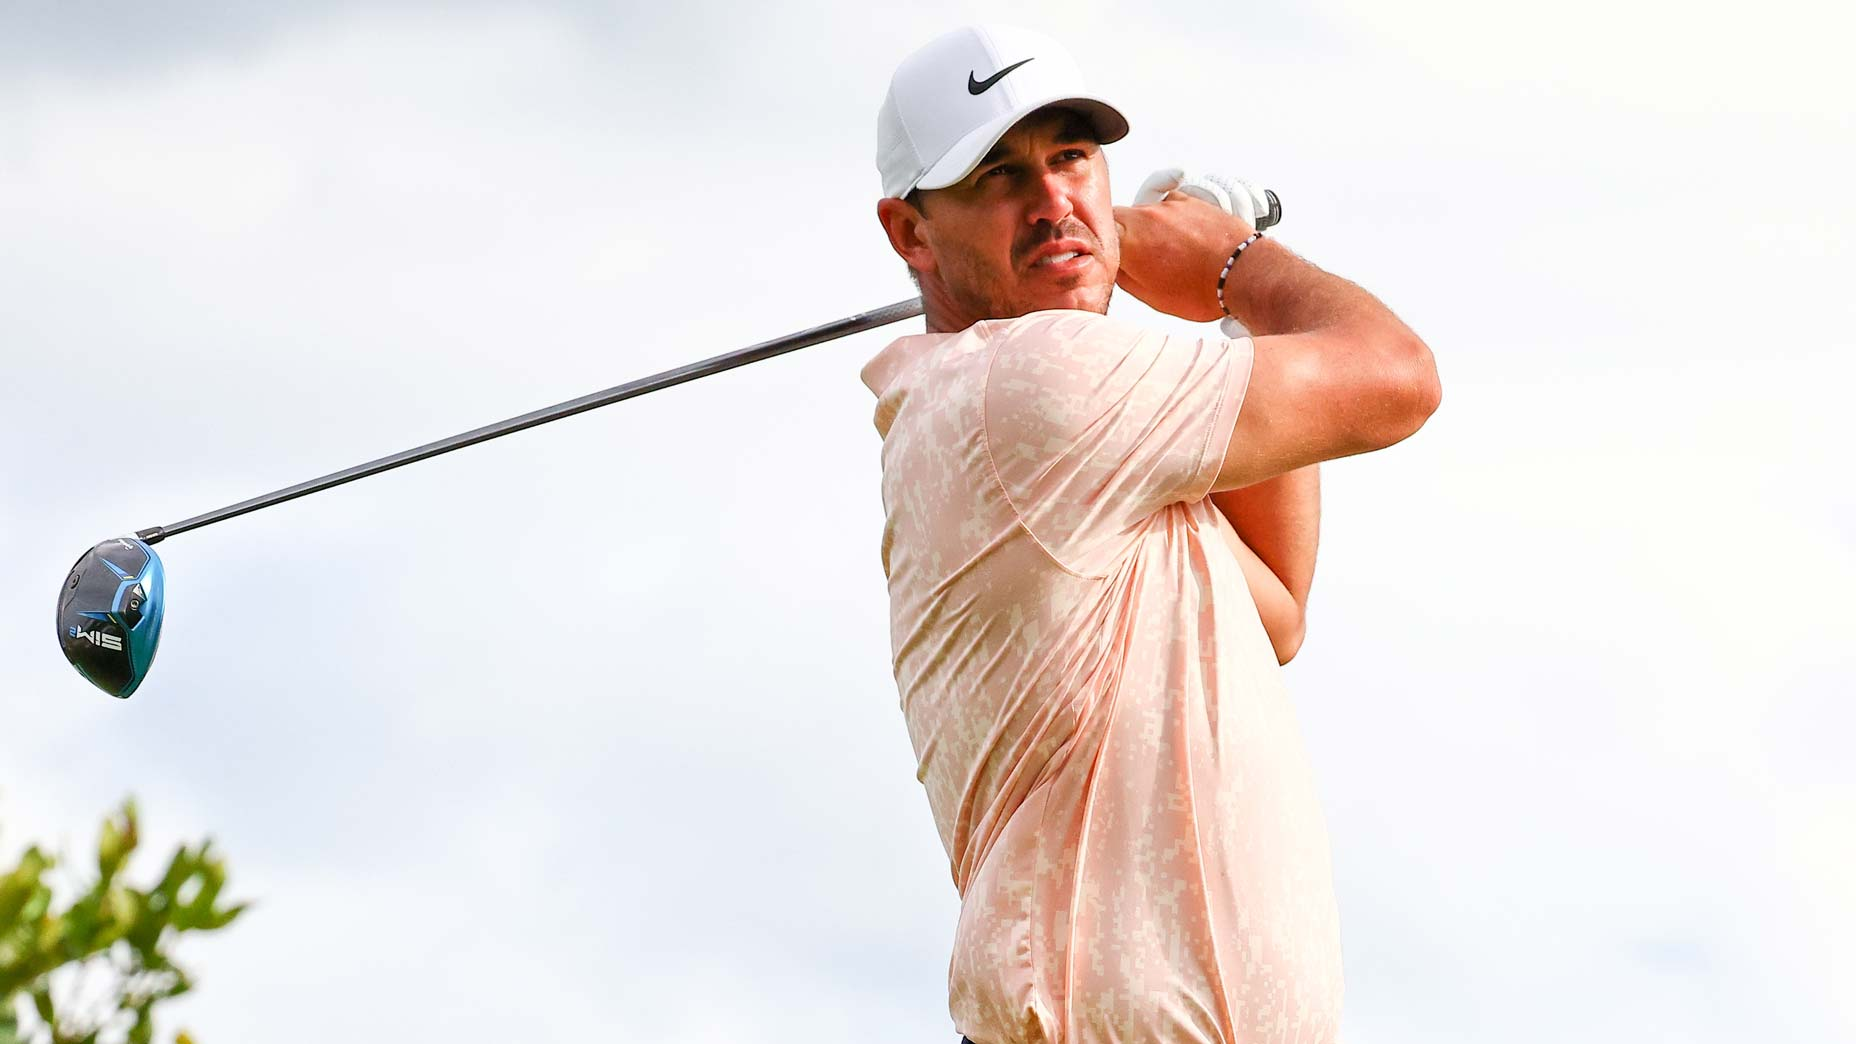 Brooks Koepka hits tee shot during the 2021 Northern Trust golf tournament